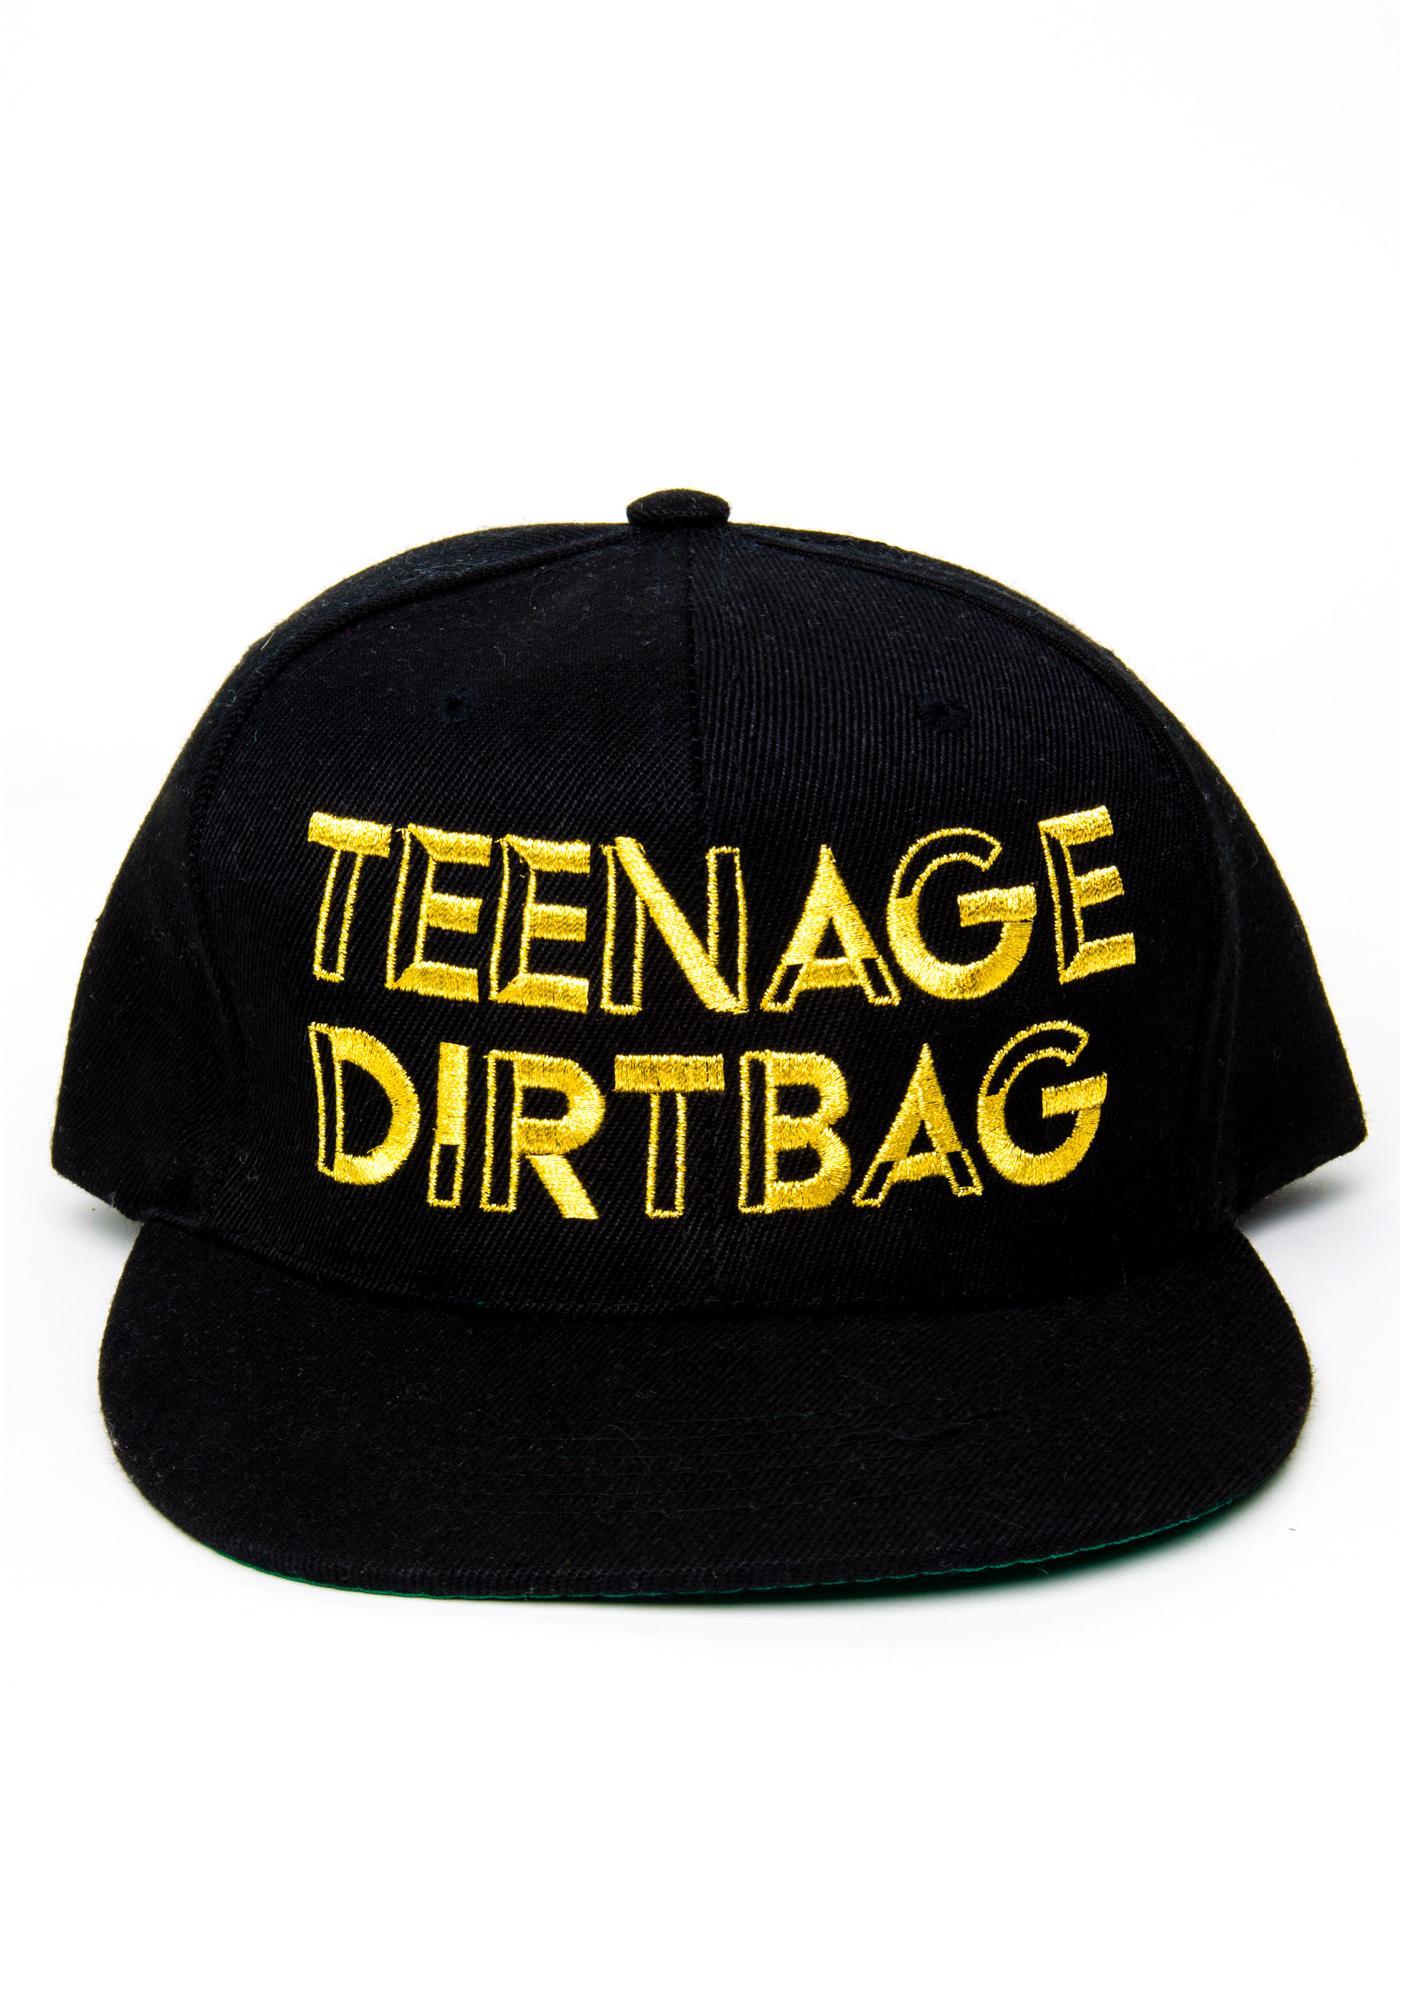 United Couture Teenage Dirtbag Snapback